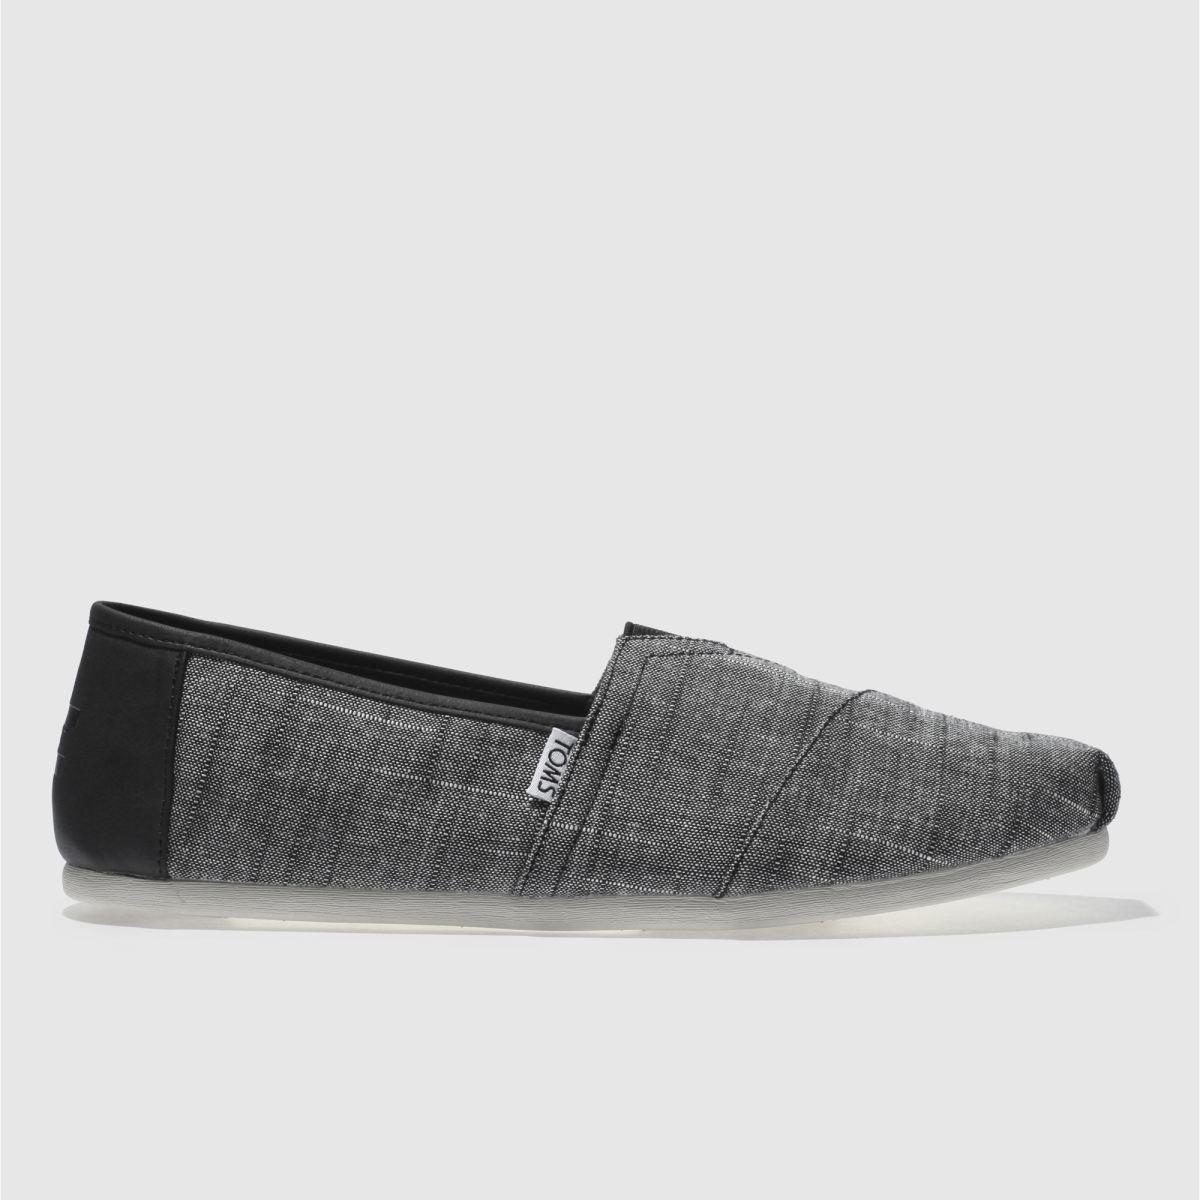 Toms Black & Grey Classic Shoes